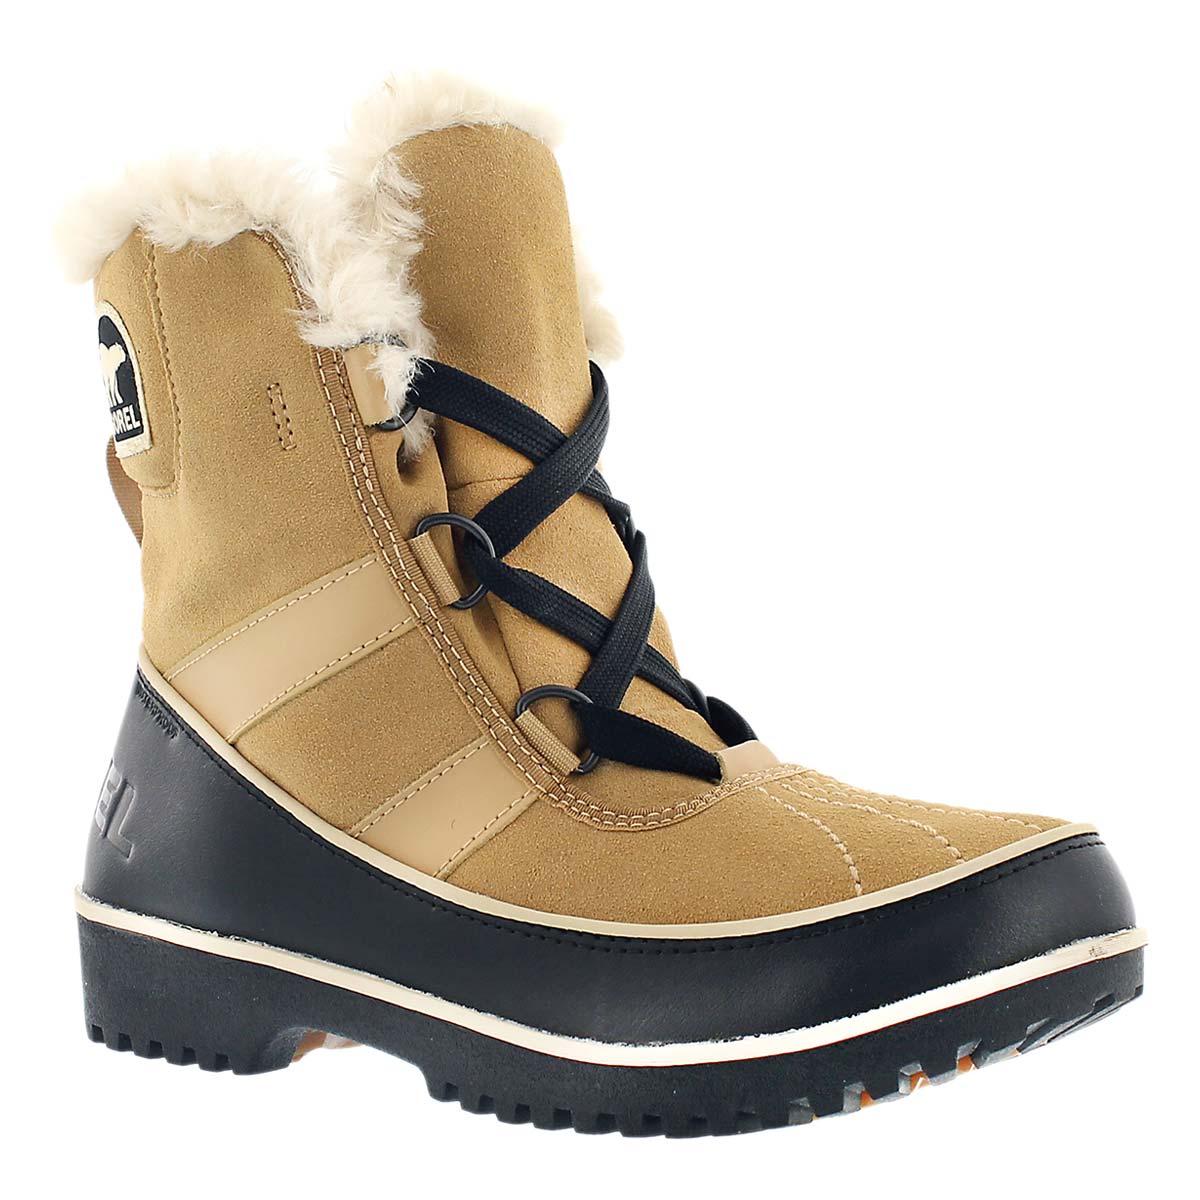 Women's TIVOLI II curry mid shaft winter boots